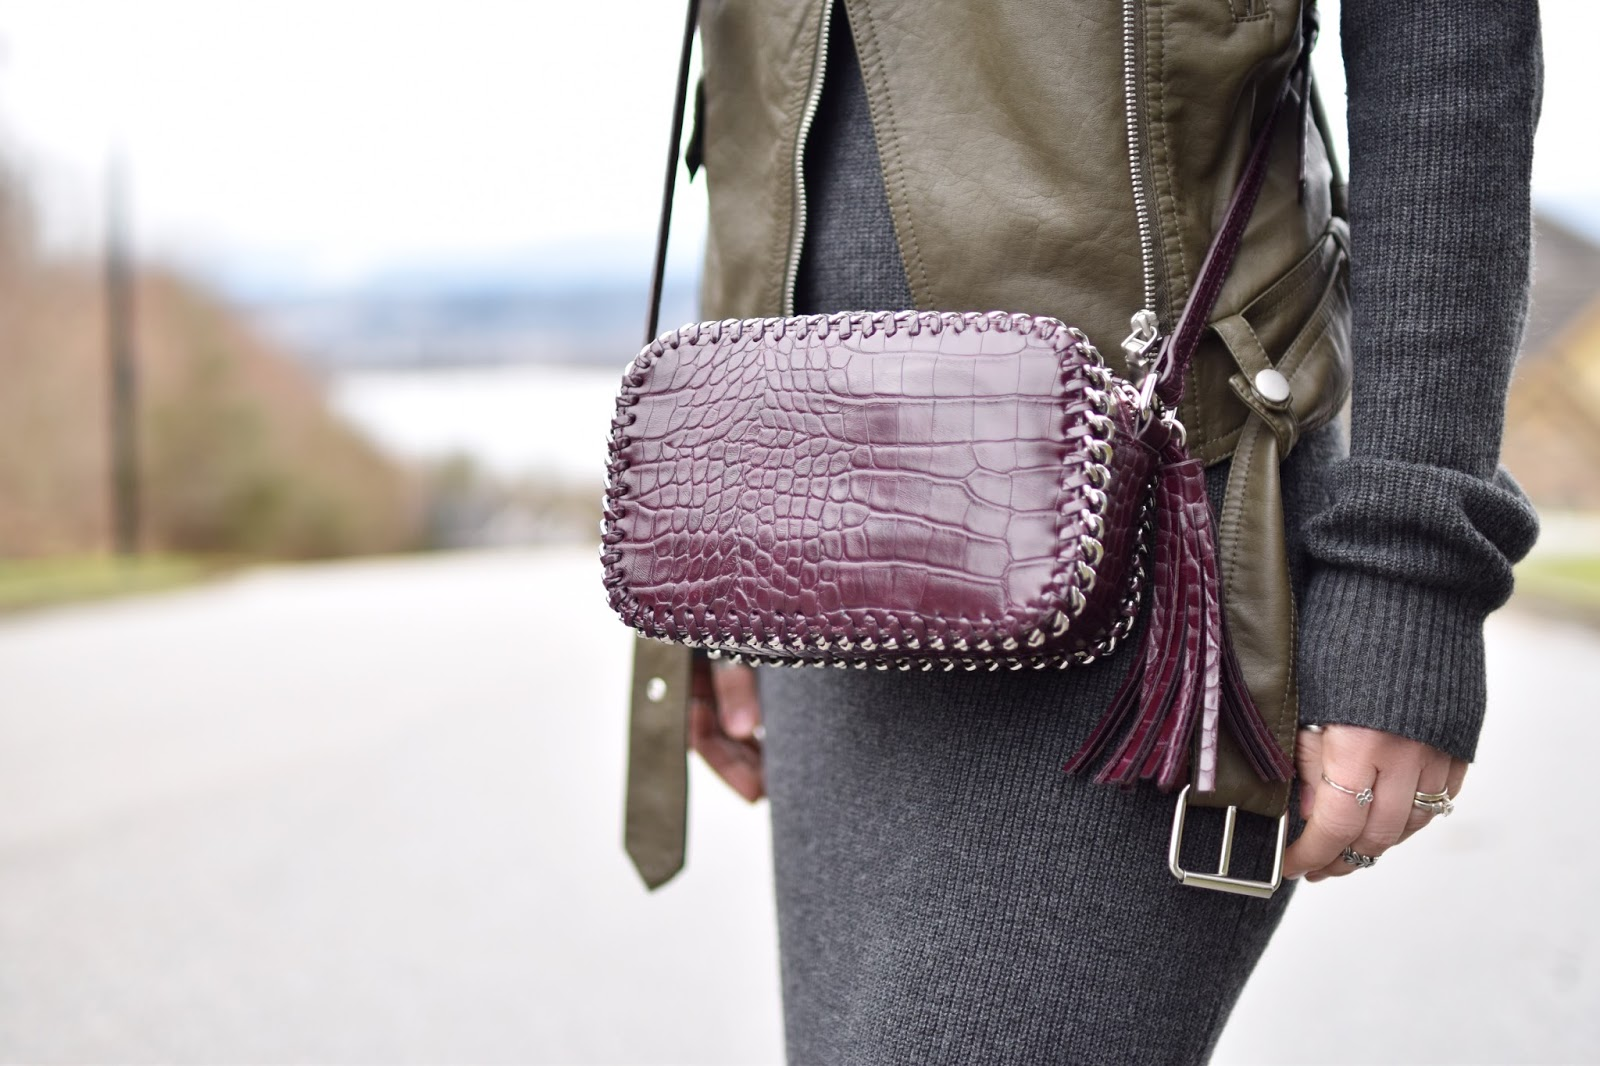 Monika Faulkner outfit inspiration - turtleneck sweater dress, motorcycle vest, cross-body bag